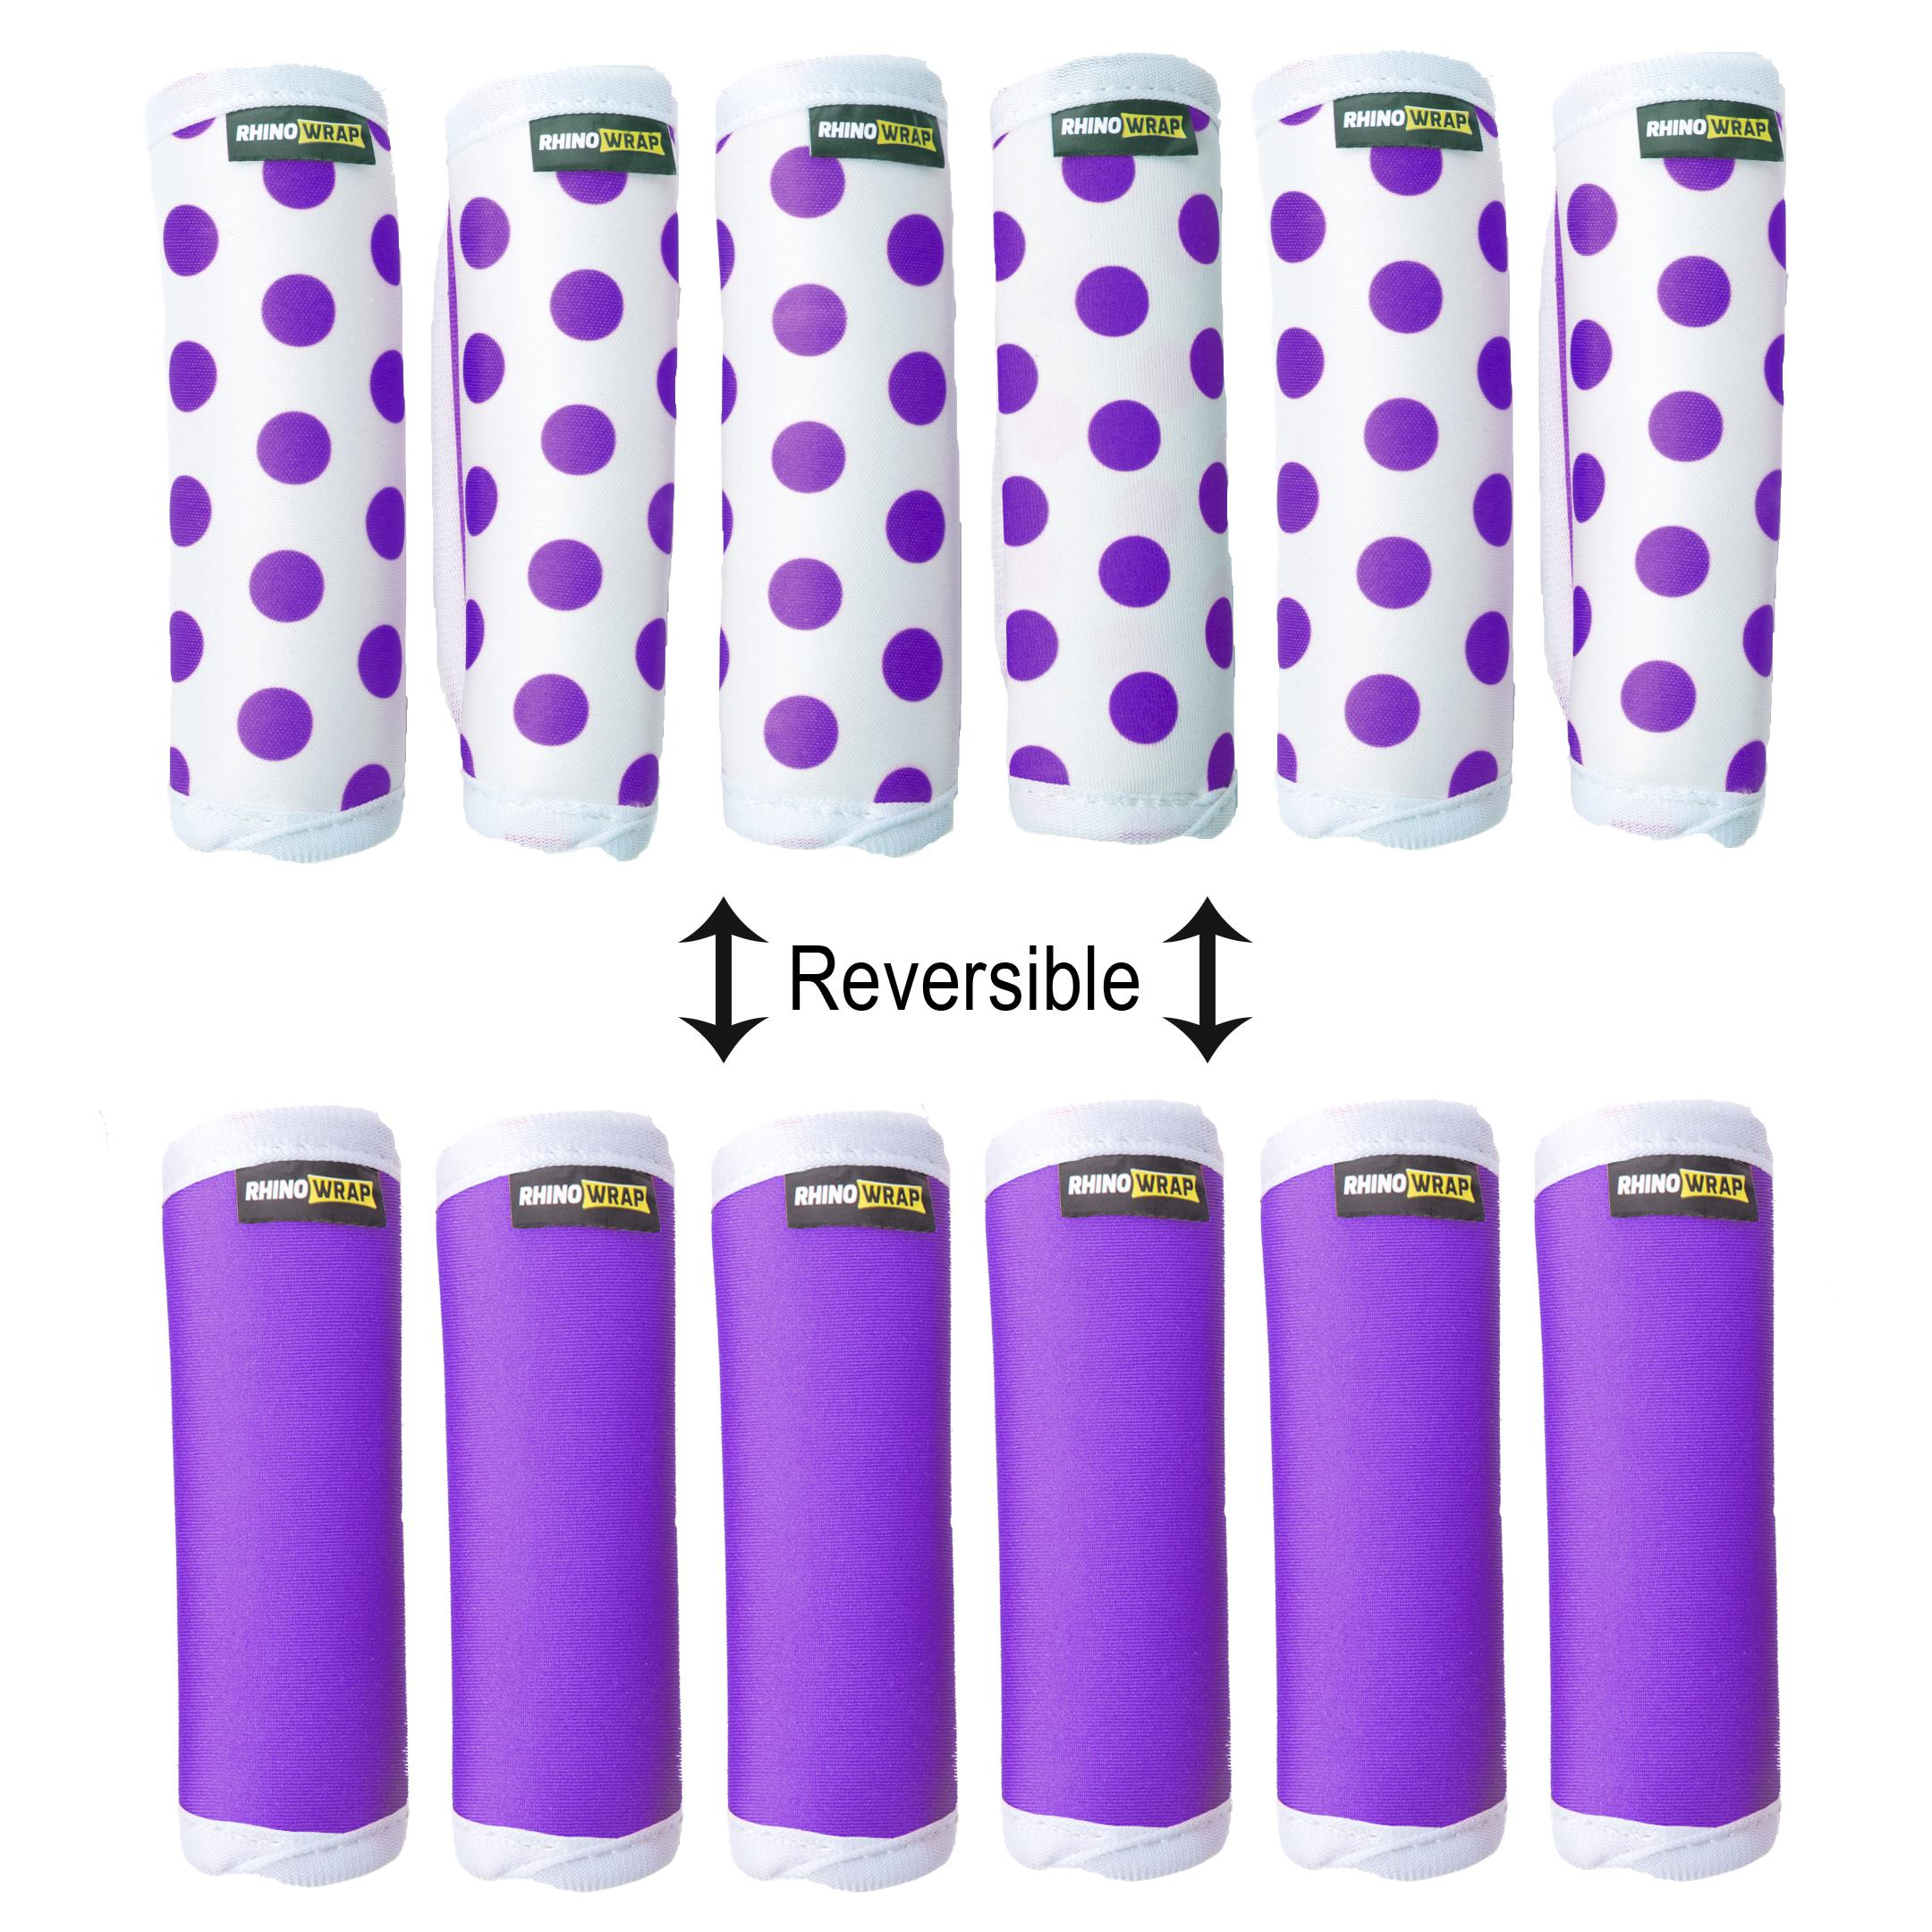 Rhino Wrap DOTS! Purple Luggage Locators (Quantity 6) Reversible: Solid Purple